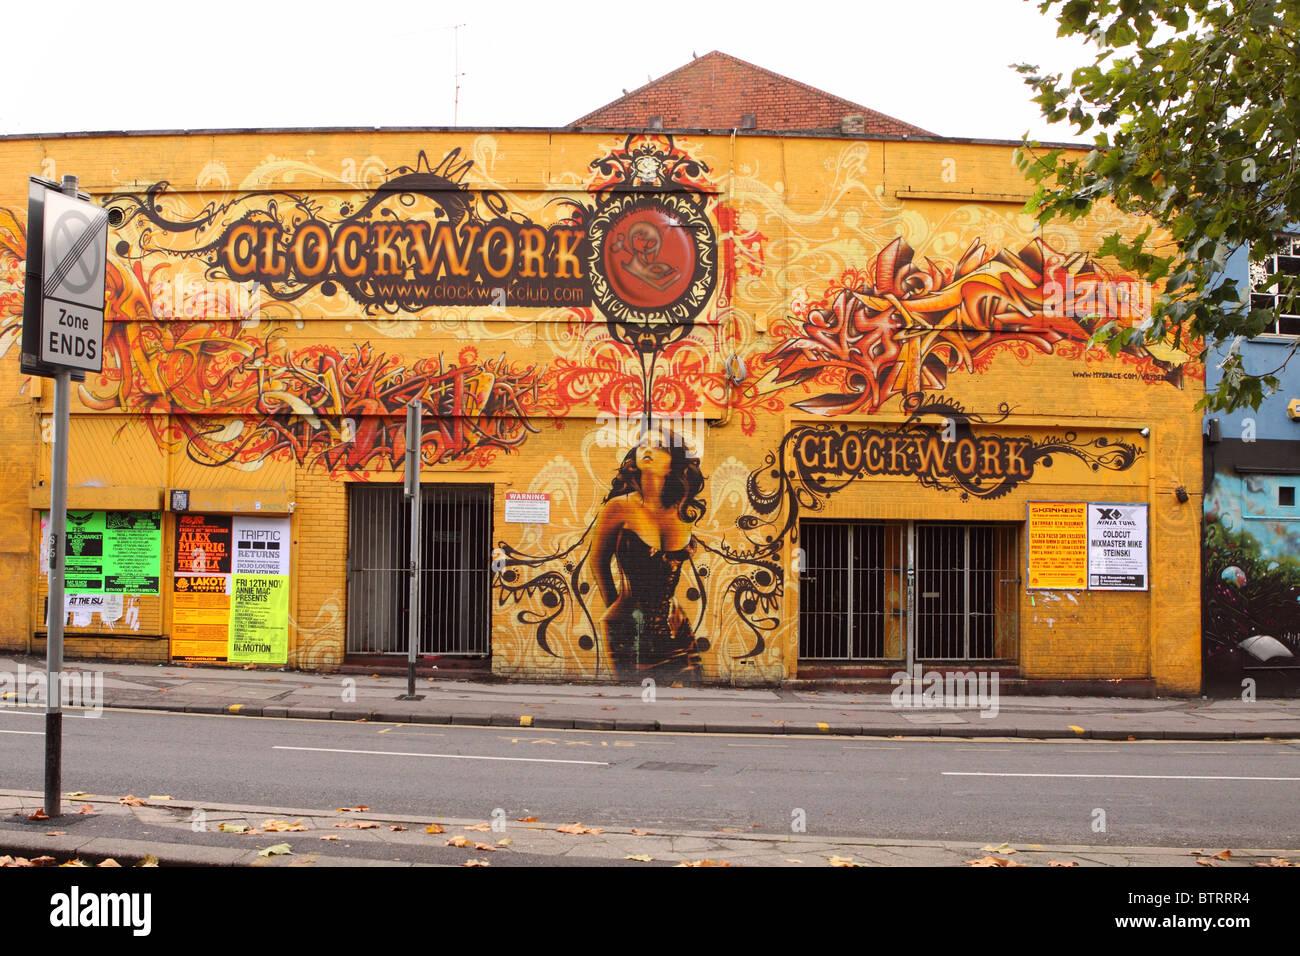 The Clockwork Club in the Stokes Croft area of Bristol a live music venue club - Stock Image